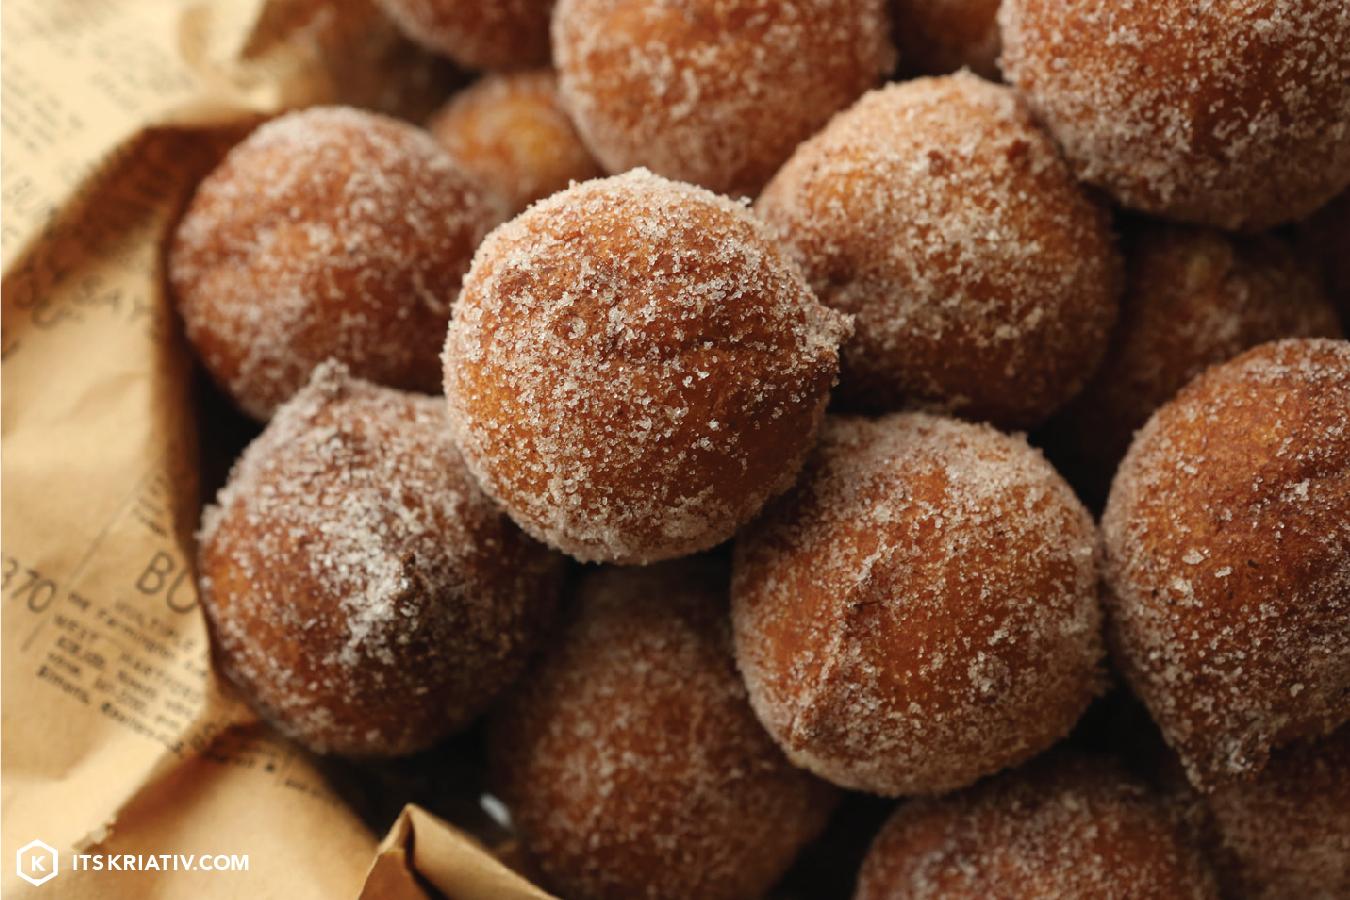 ItsKriativ_Food_Zeppole_Cinnamon_Sugar-08.jpg